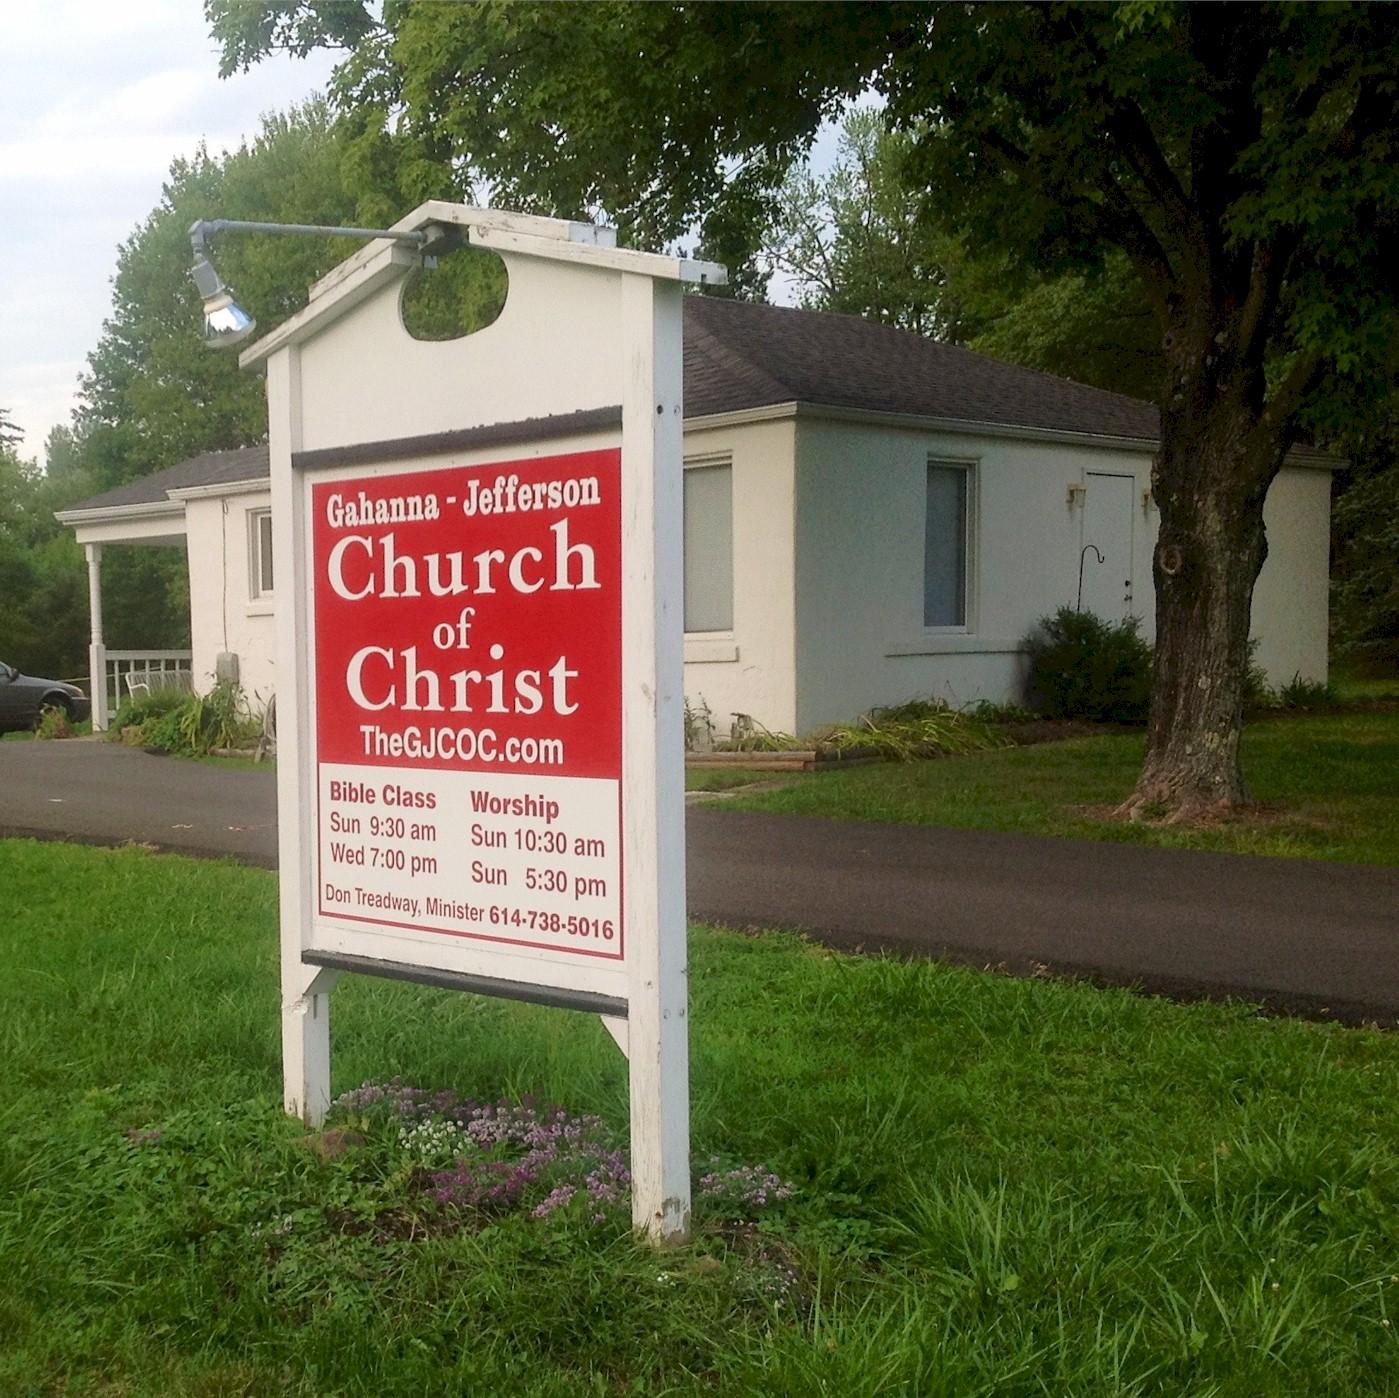 The Gahanna-Jefferson Church of Christ